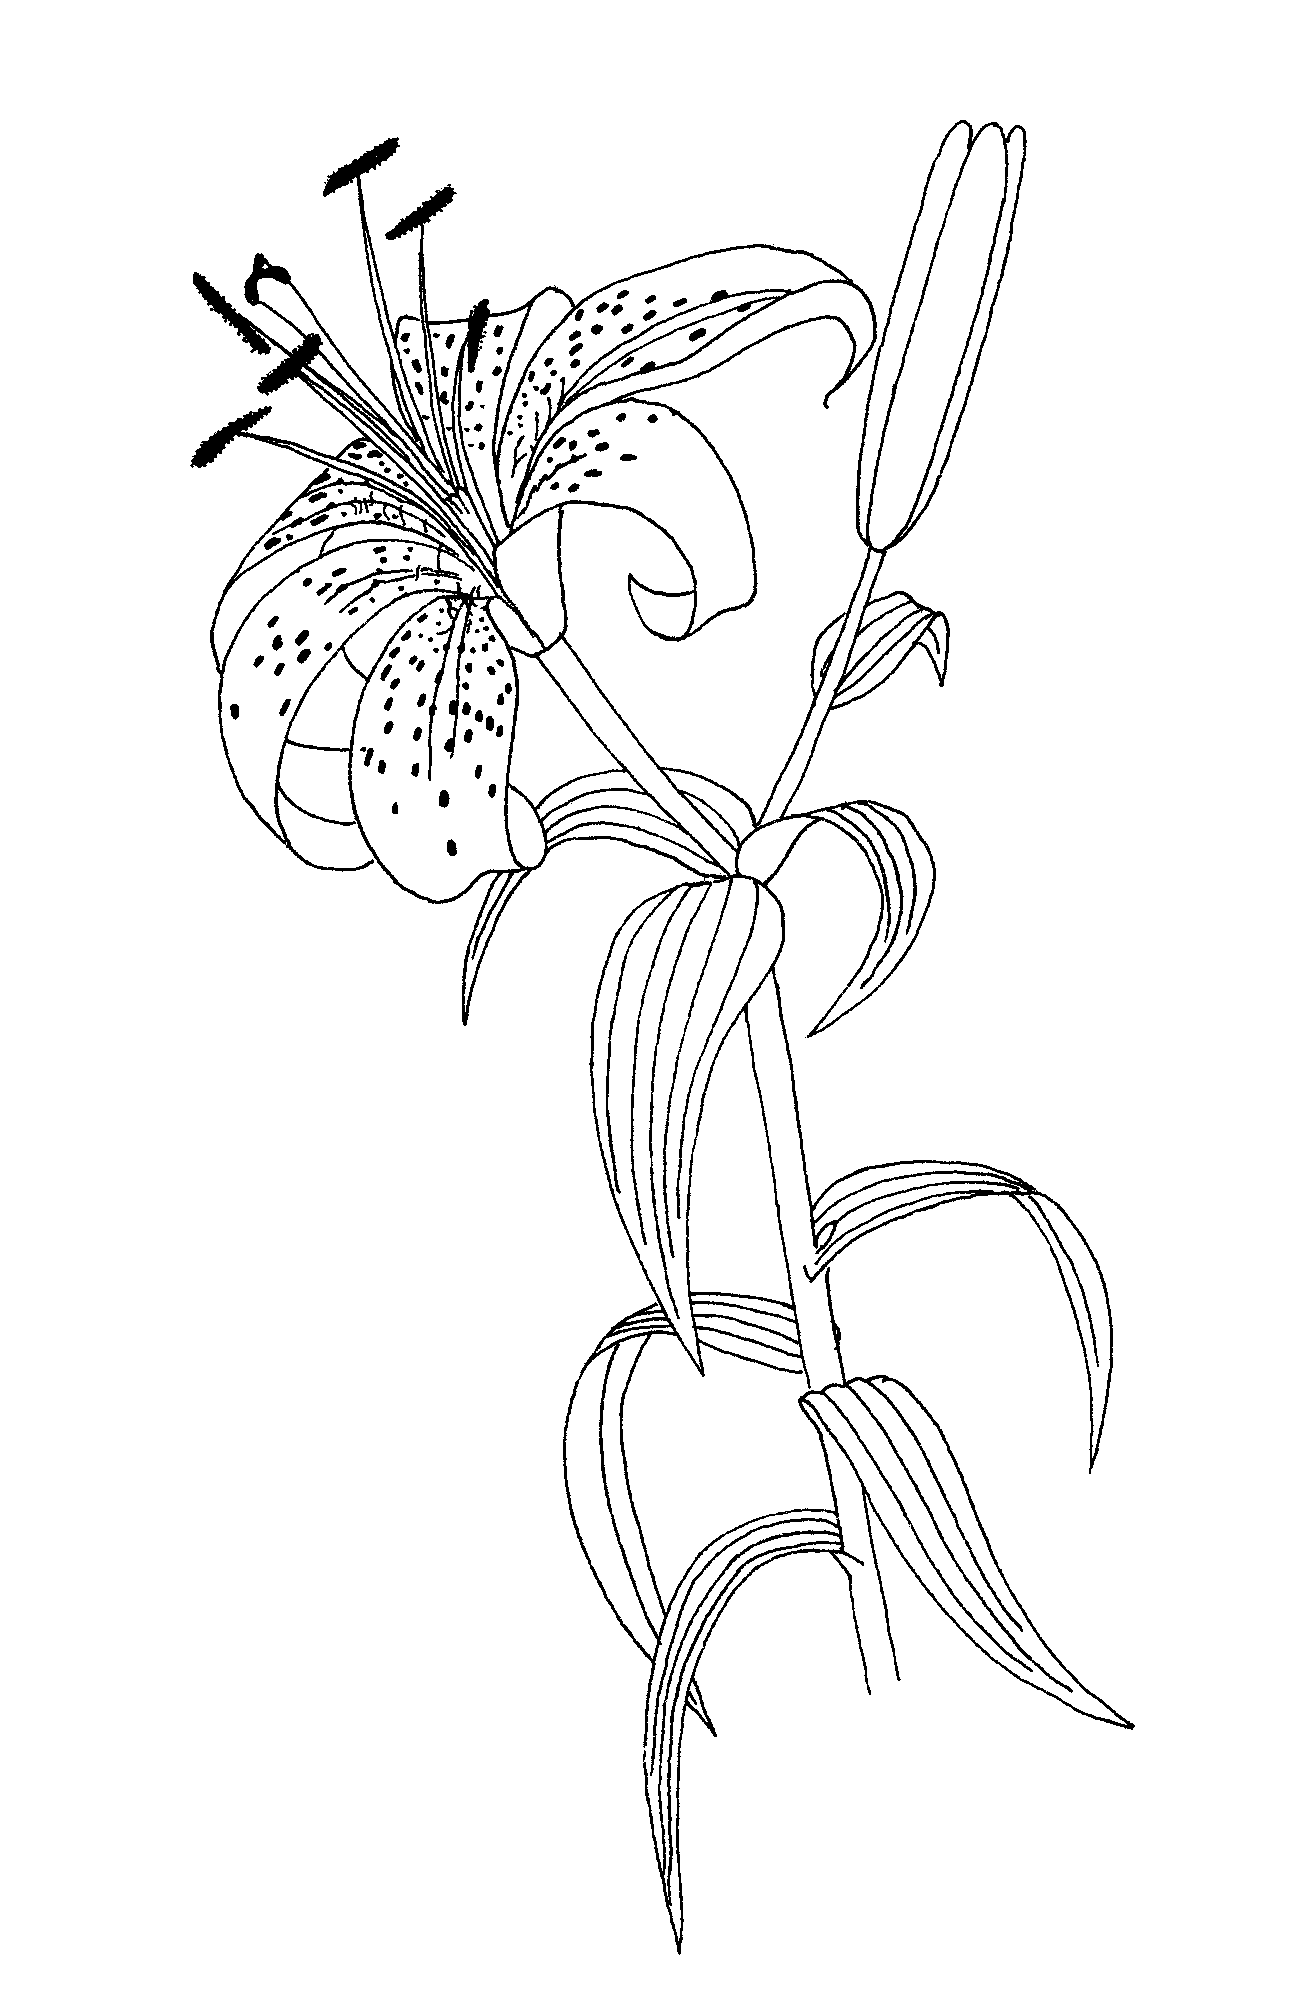 carnivorous plants coloring pages | Pitcher Plant Coloring Page Sketch Coloring Page